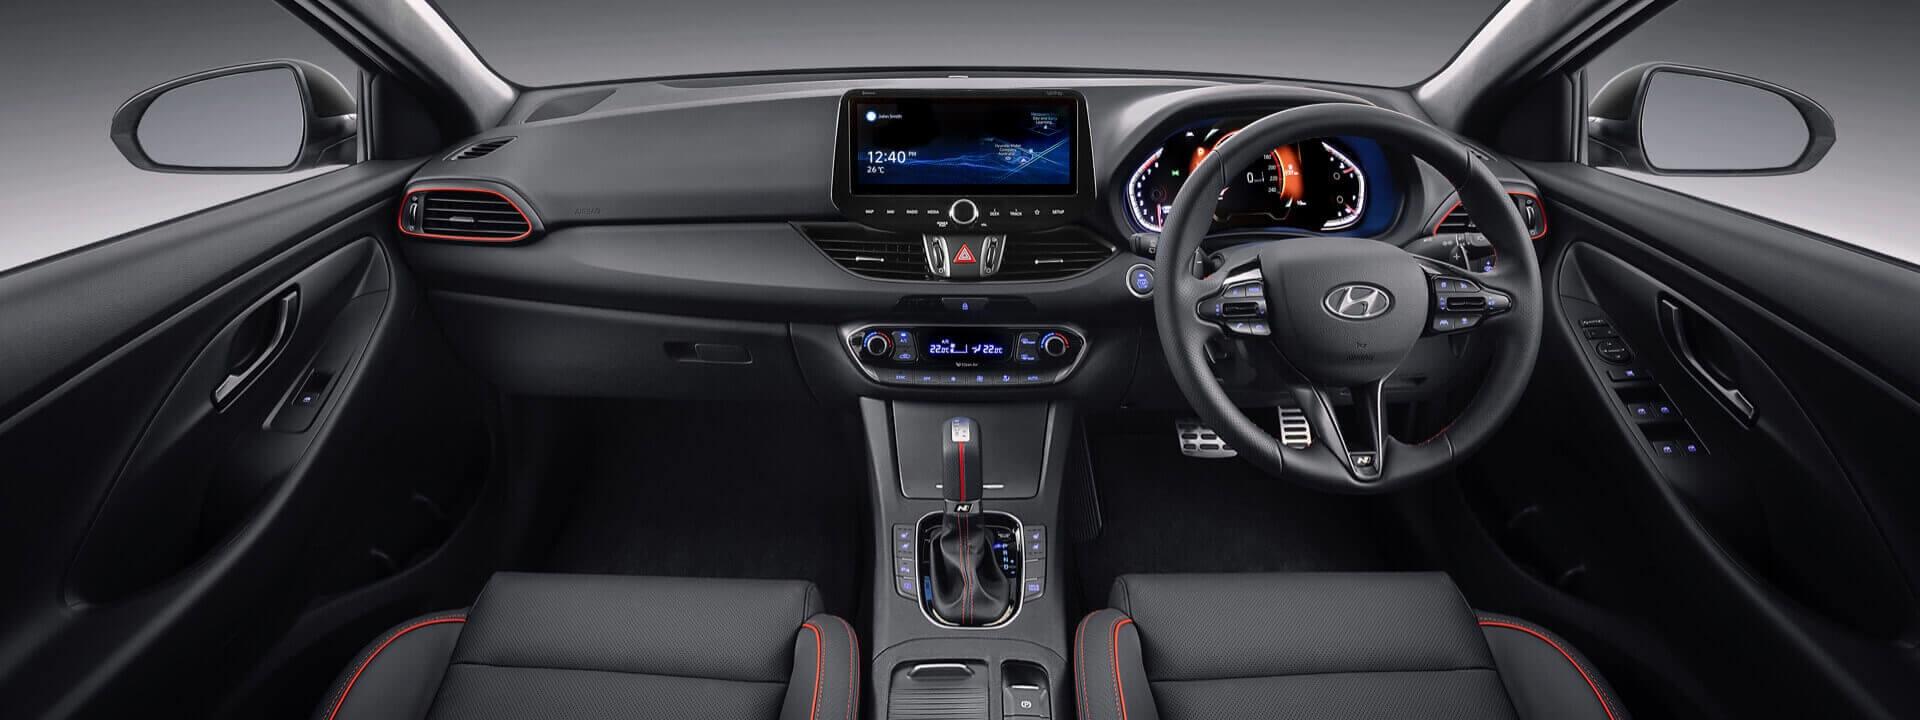 Hyundai i30 Hatch N Line Interior